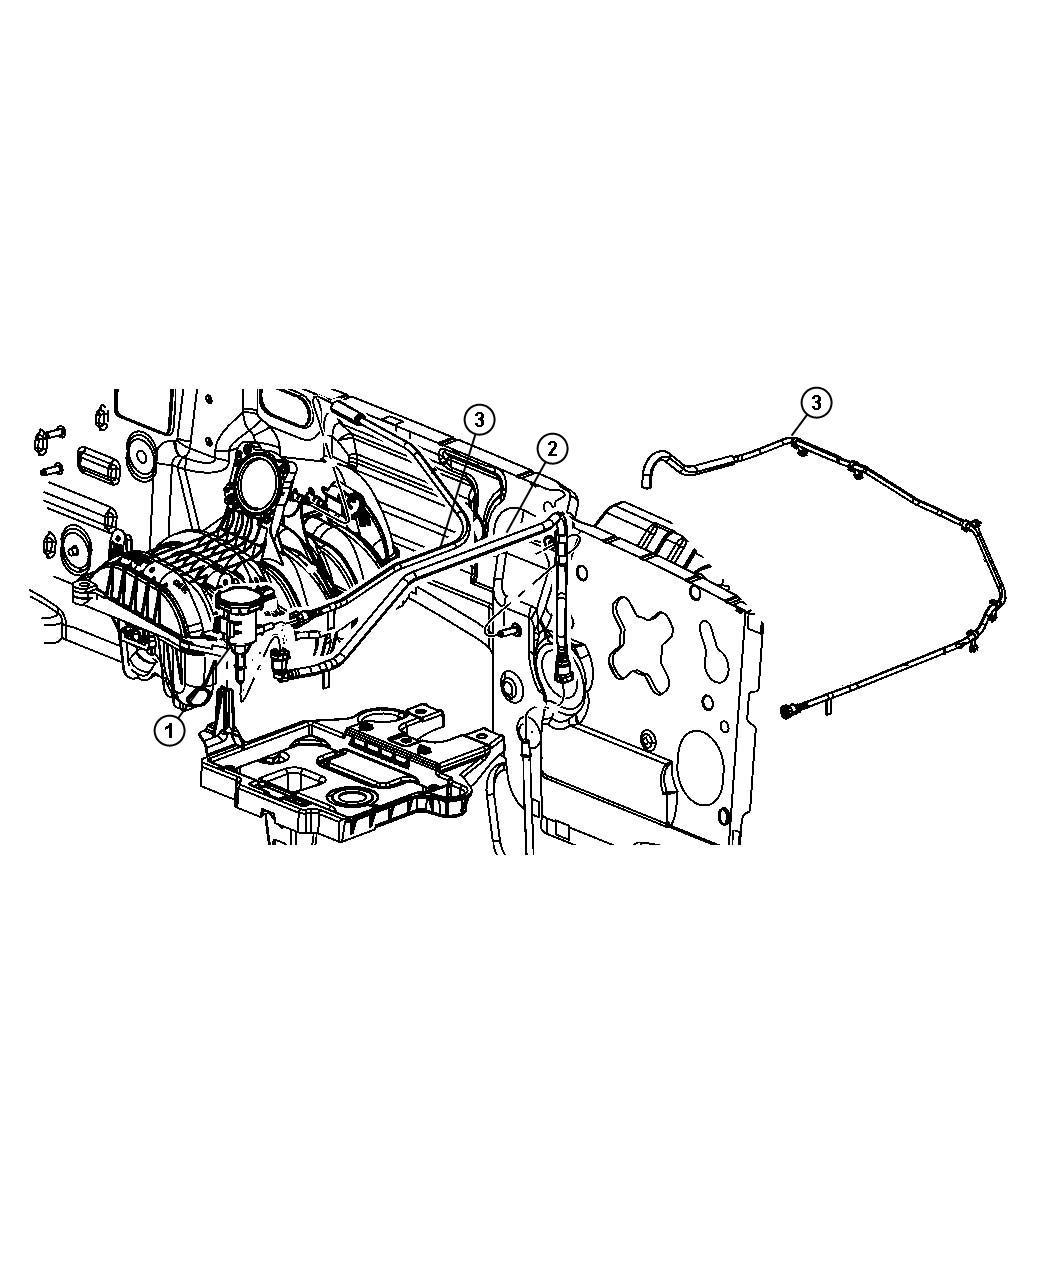 Dodge Nitro Tube Fuel Vapor Throttle Purge Body